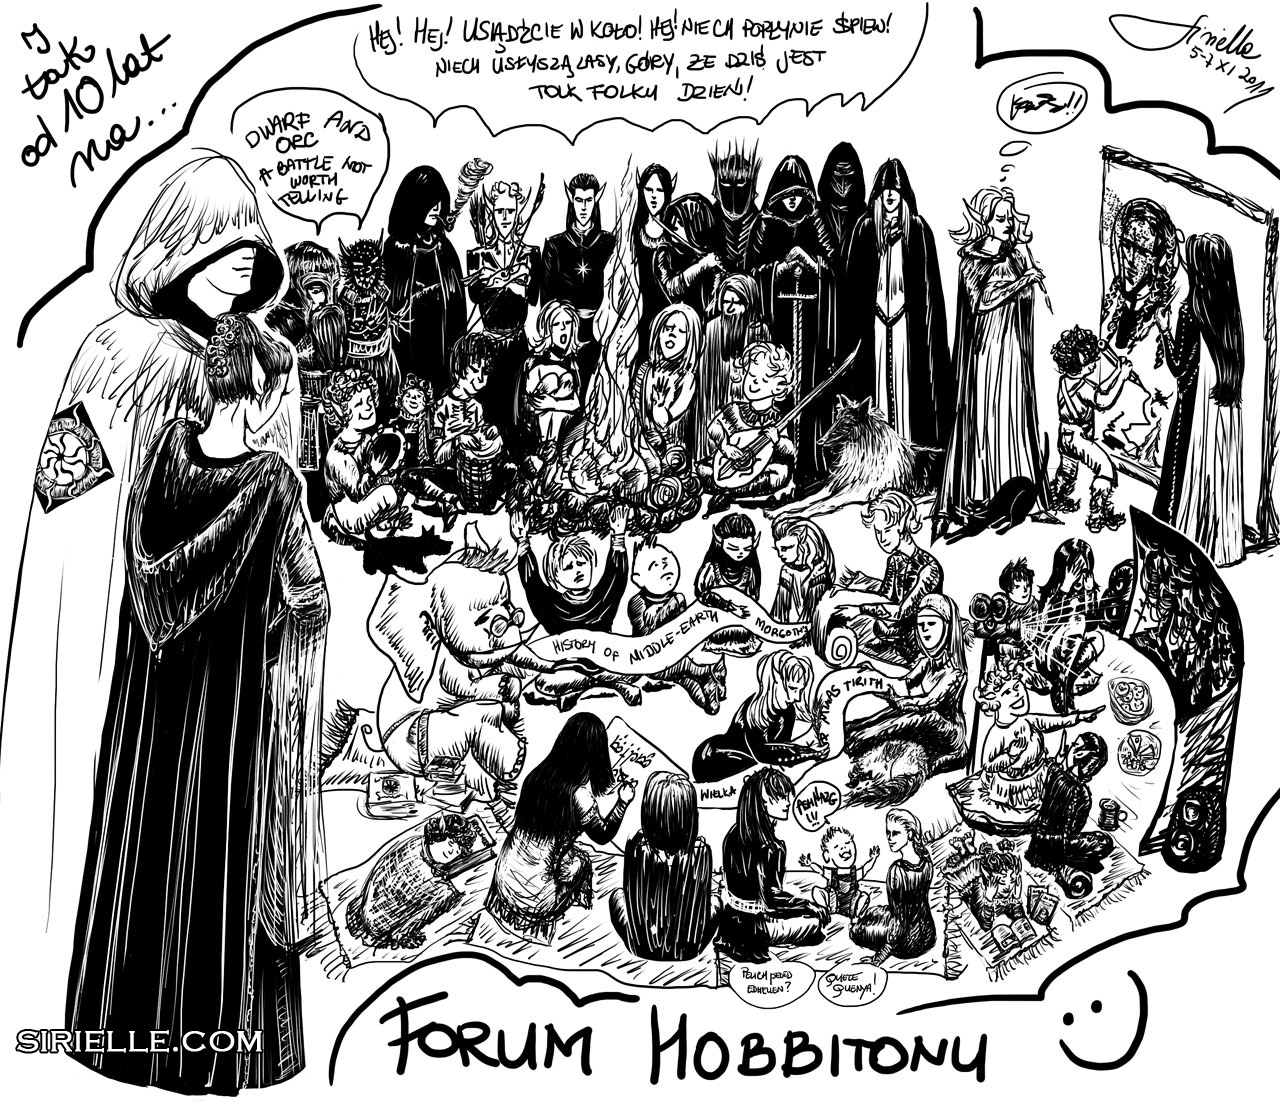 Hobbiton Forum 10th Anniversary by Sirielle